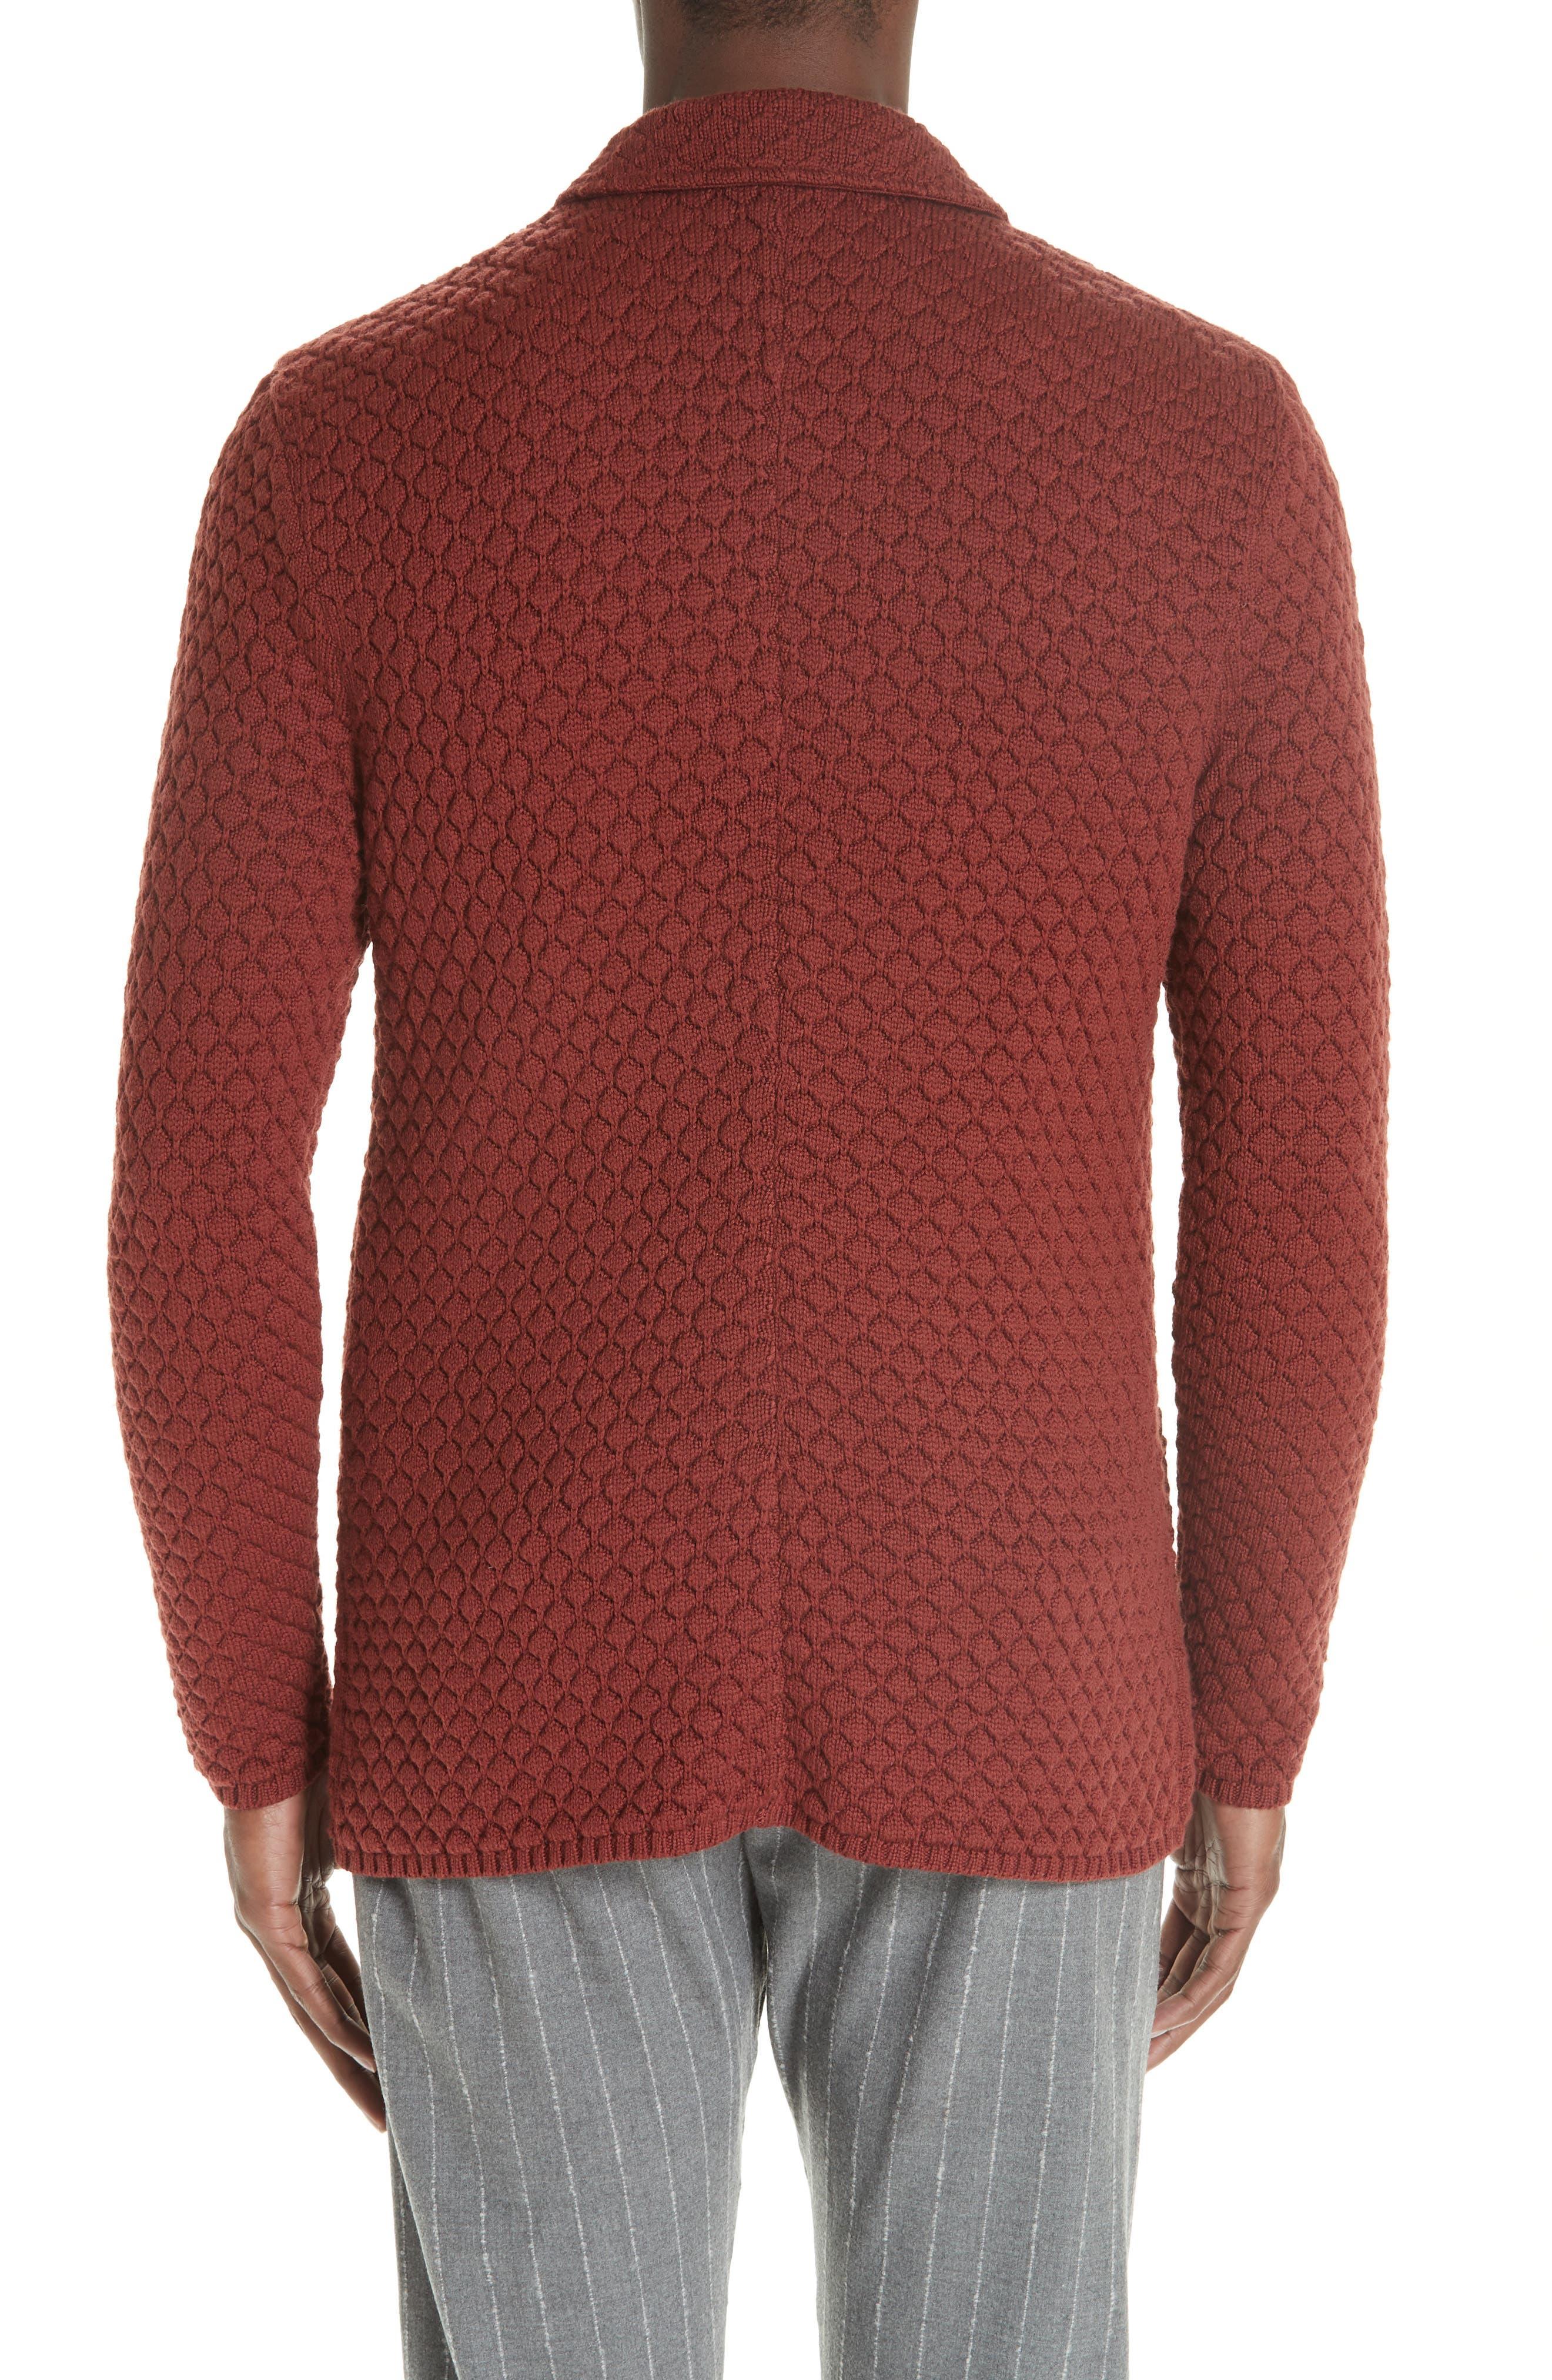 Wool Sweater Jacket,                             Alternate thumbnail 2, color,                             223